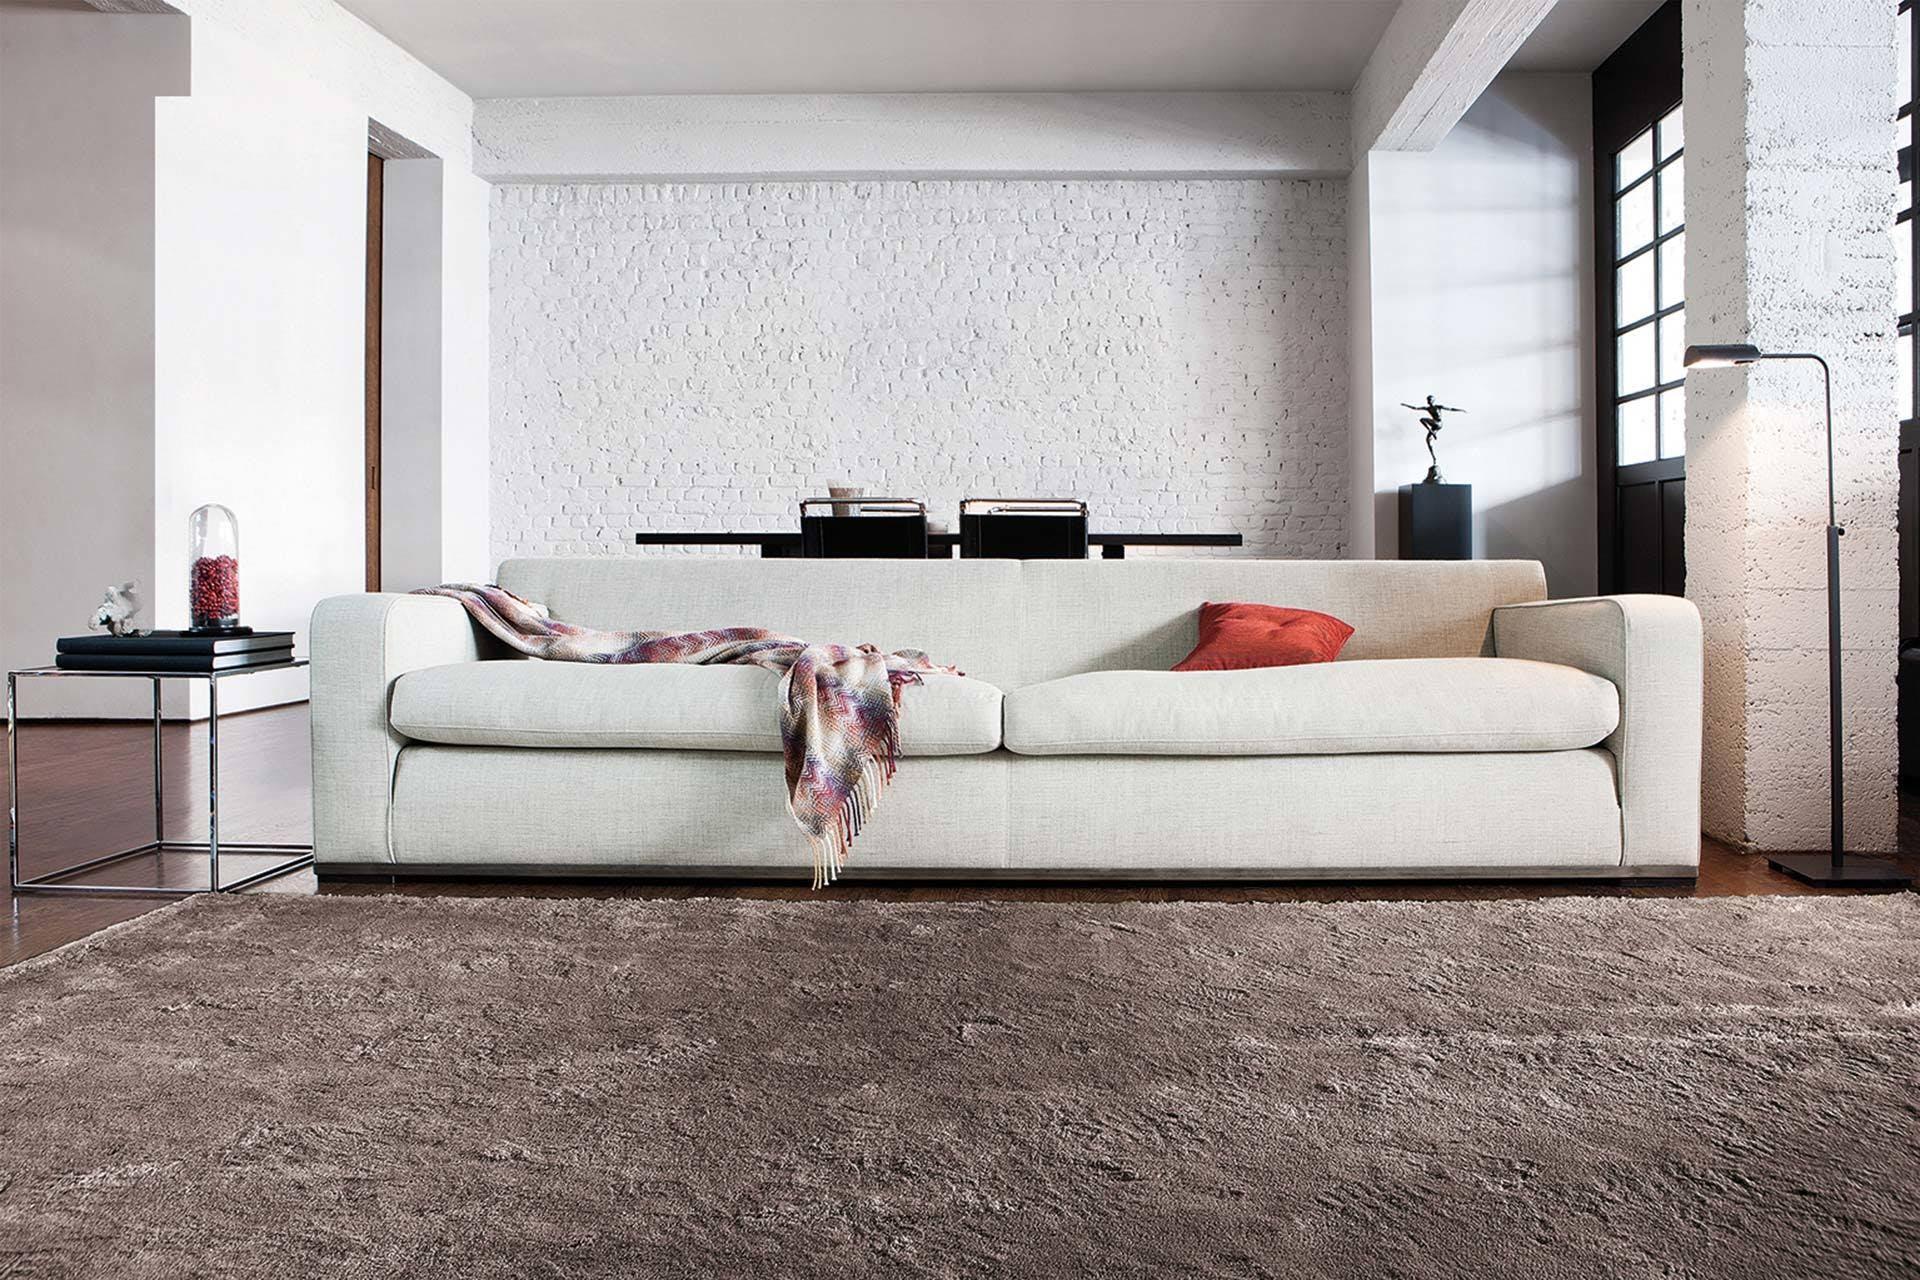 Linen Luxury Iron Sfeerbeeld Limited Edition Carpets